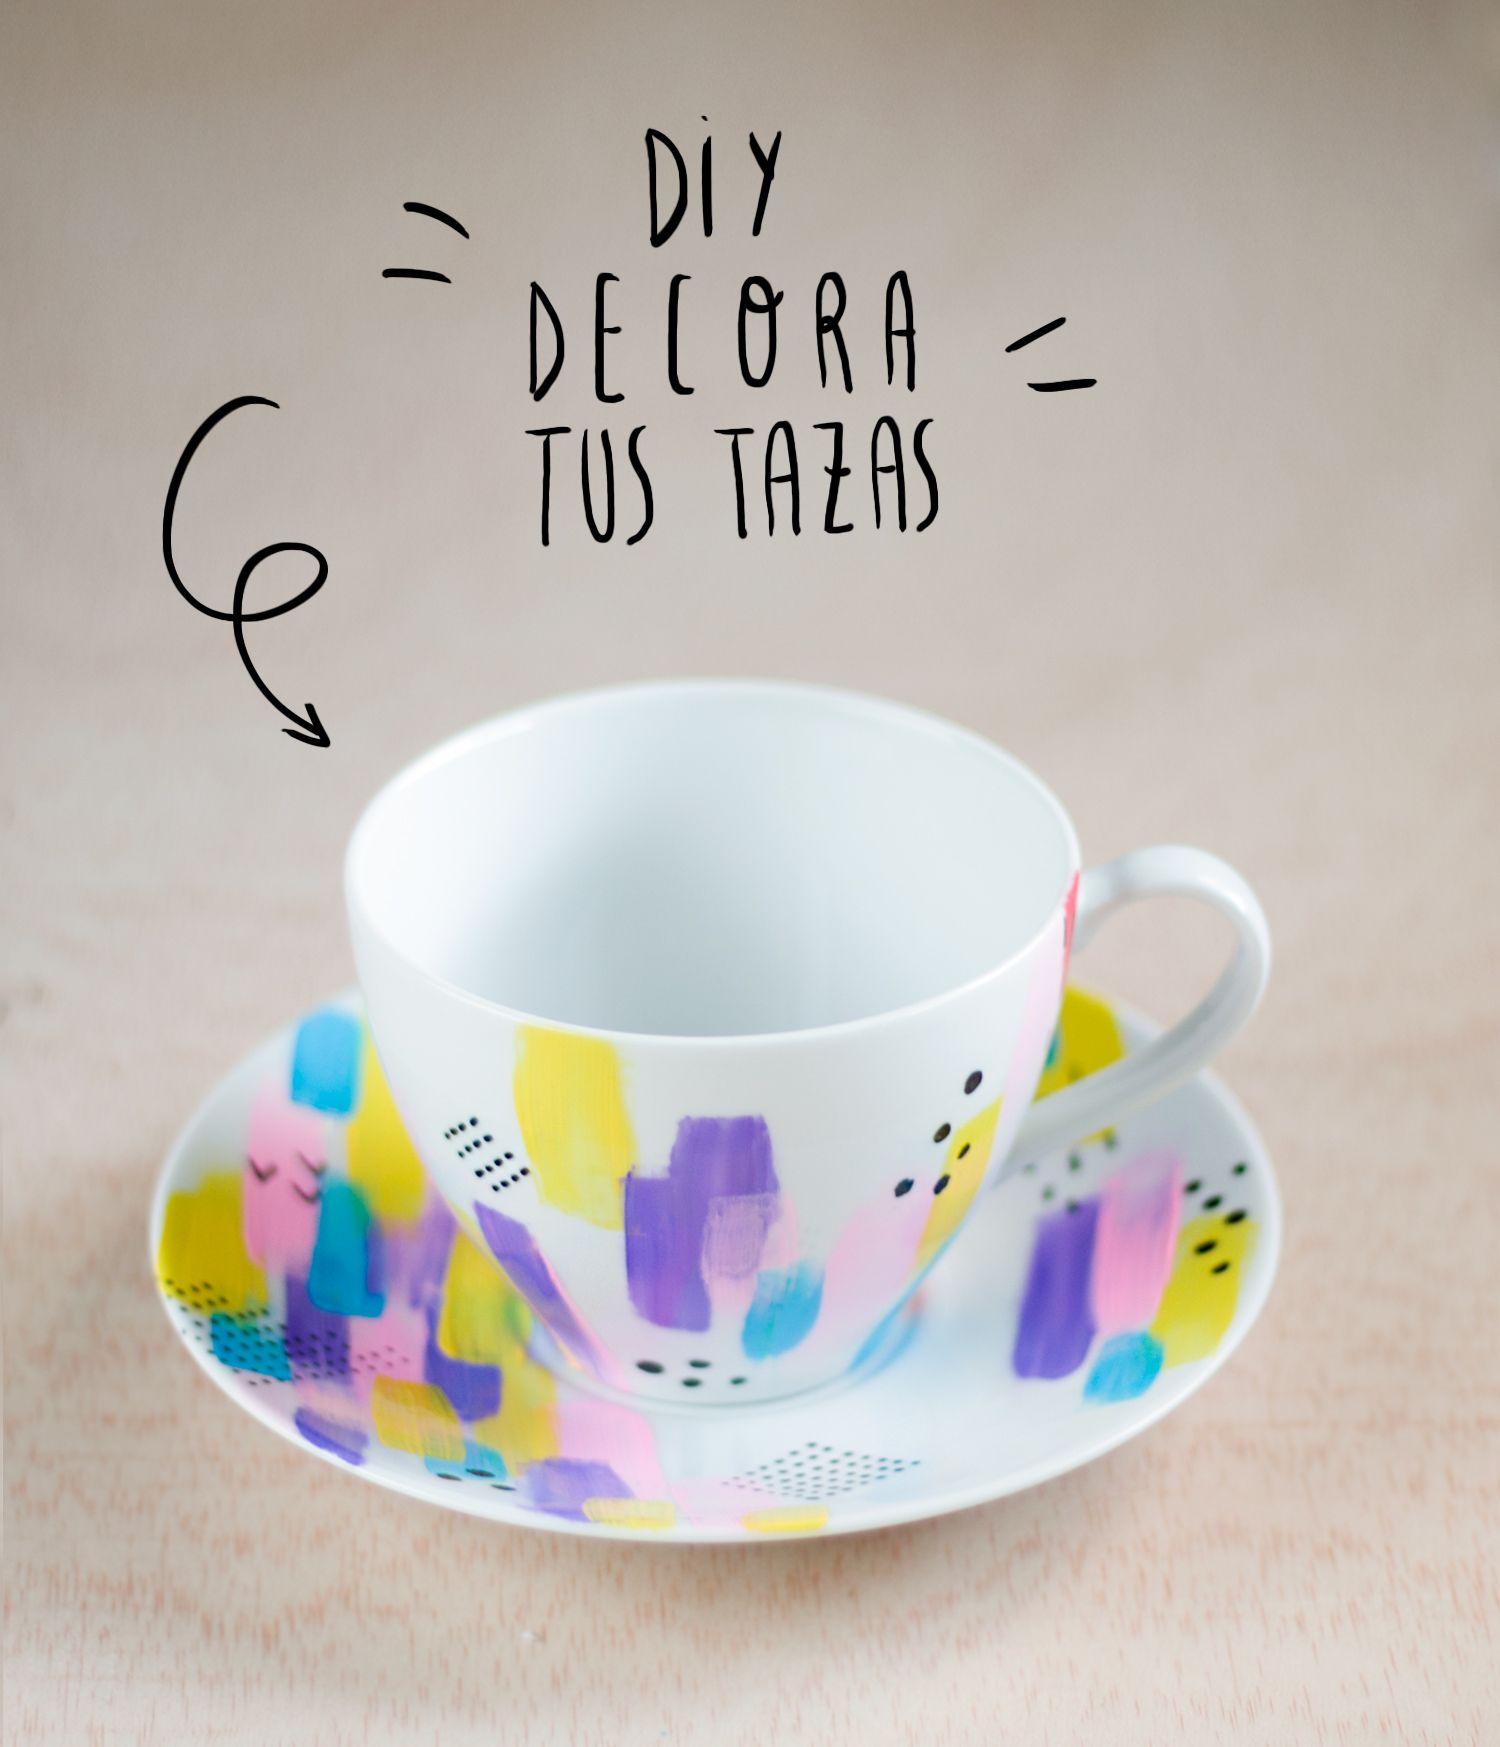 DIY: Decora tus tazas, como pintar ceramica - Aurea Mazo